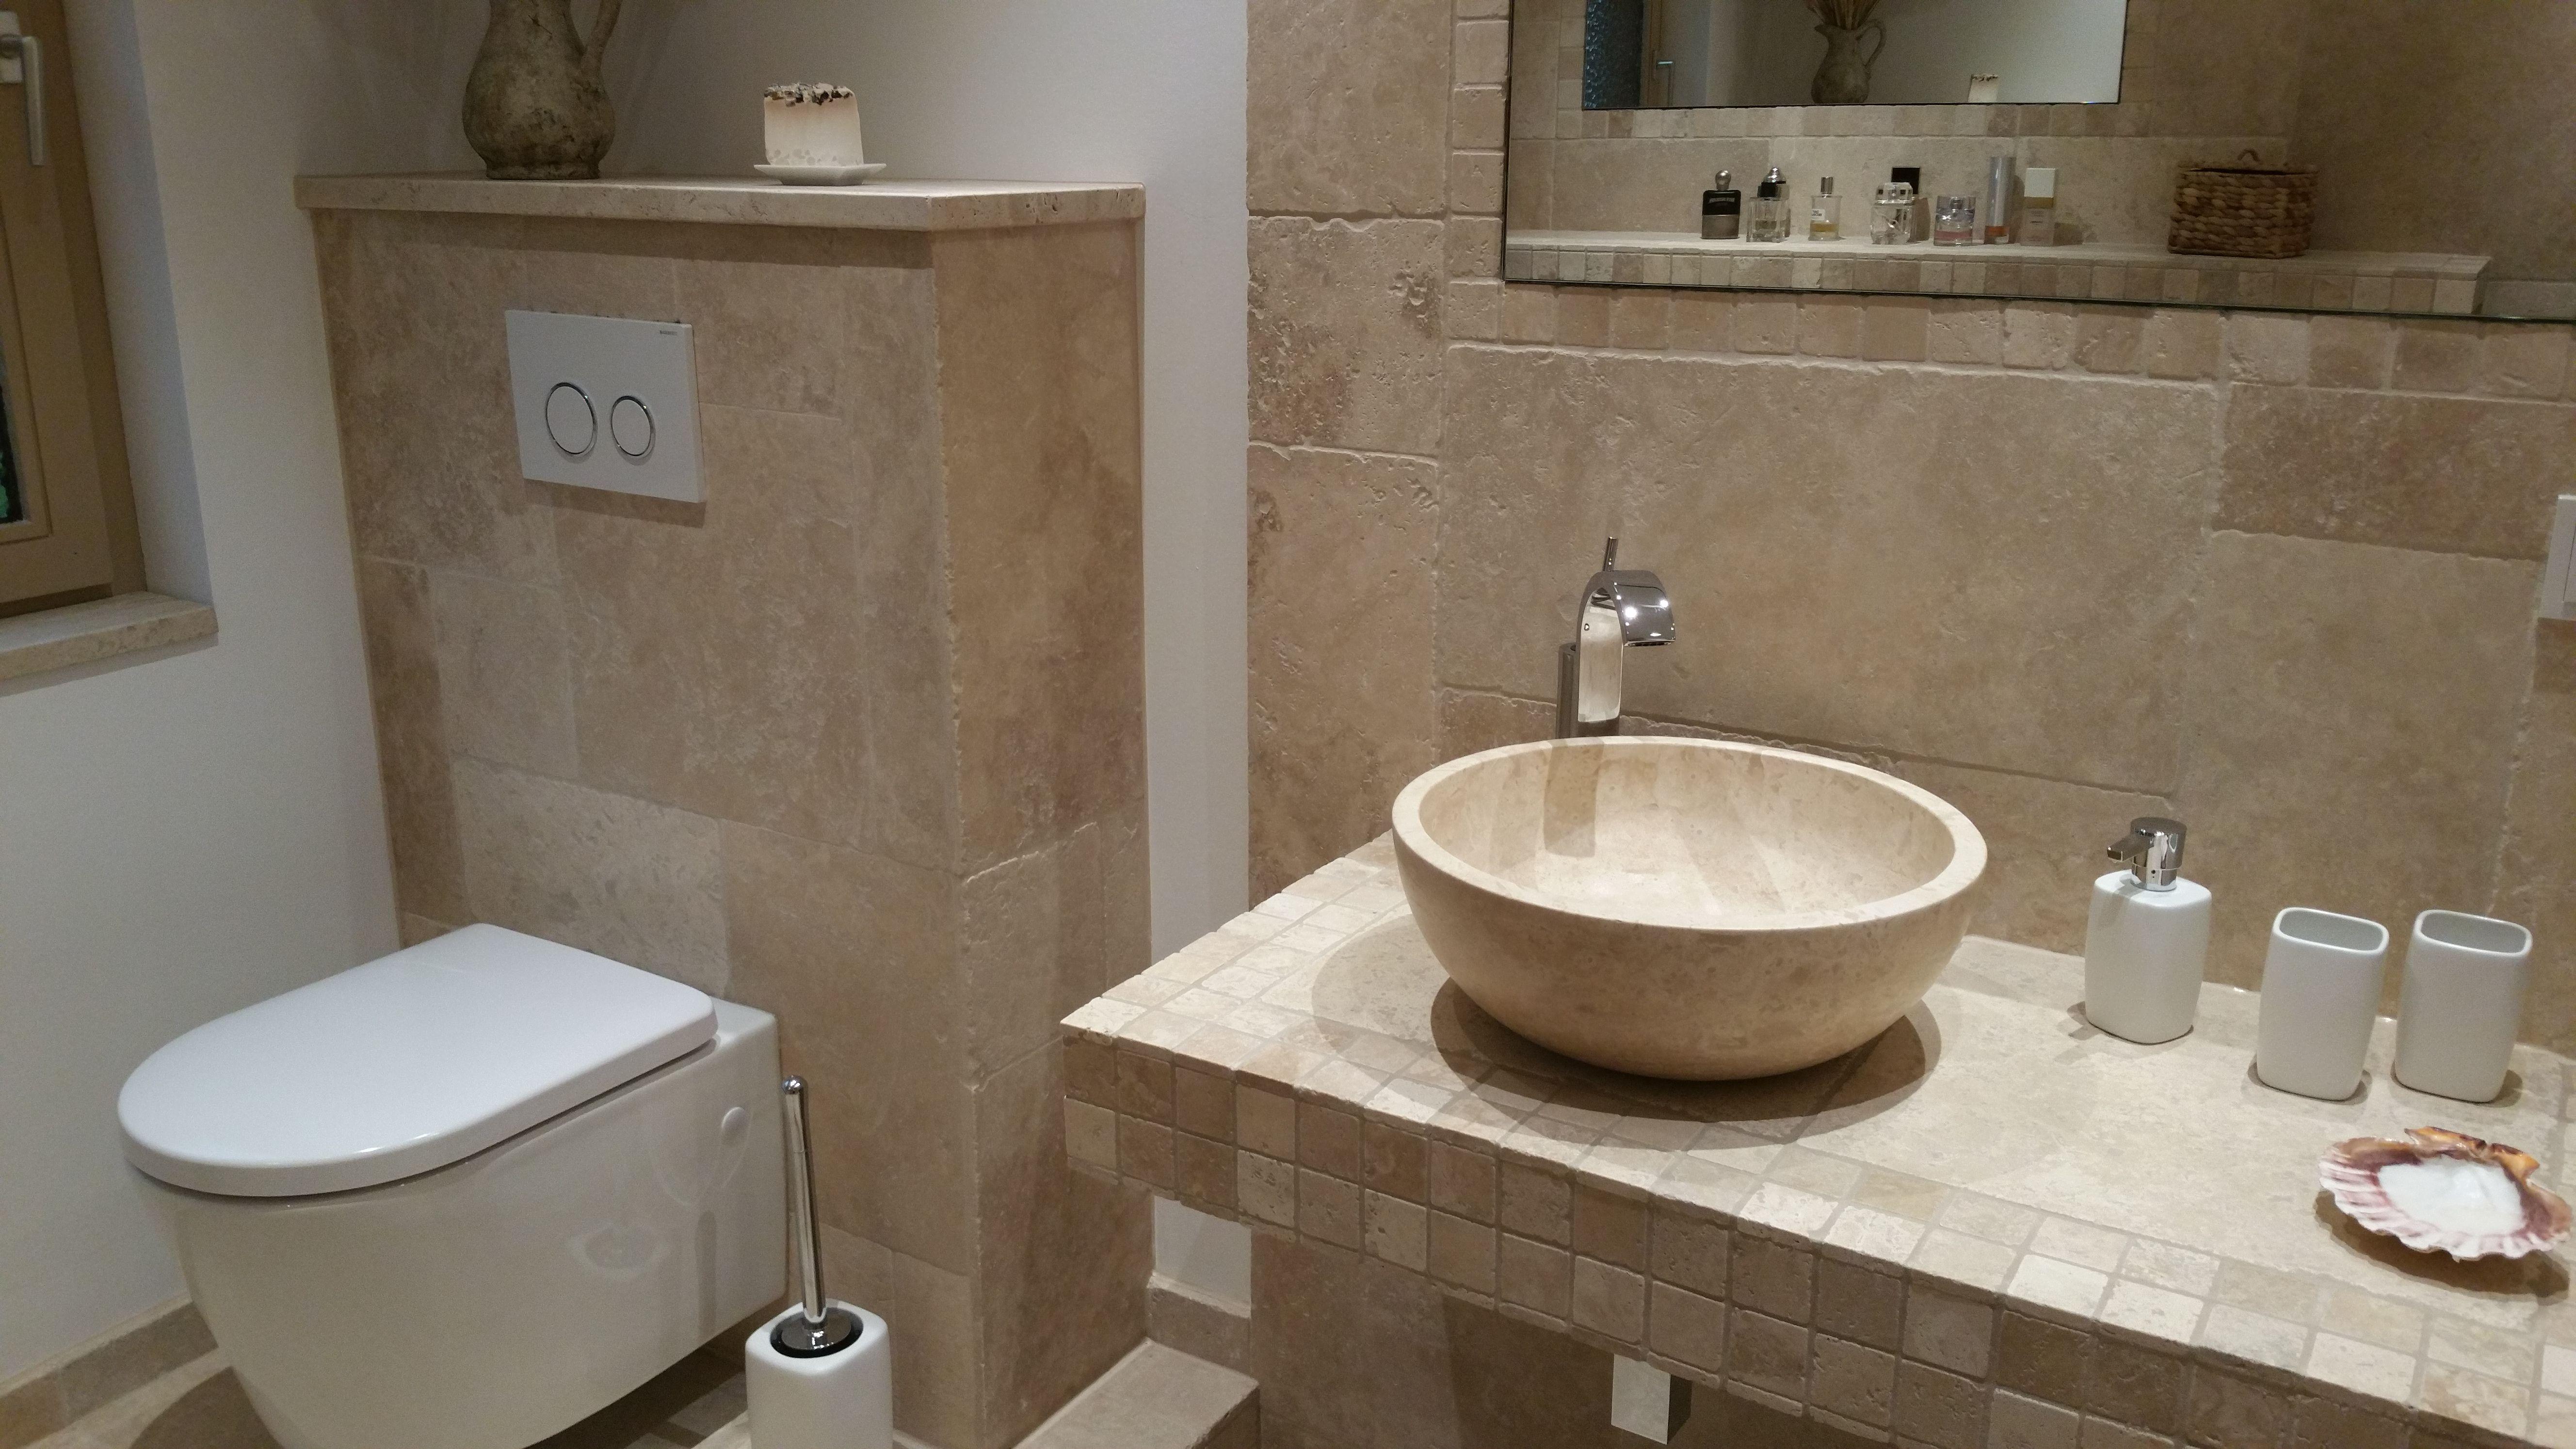 Badezimmer Ideen Mediterran Atemberaubende Dekoration Badezimmer